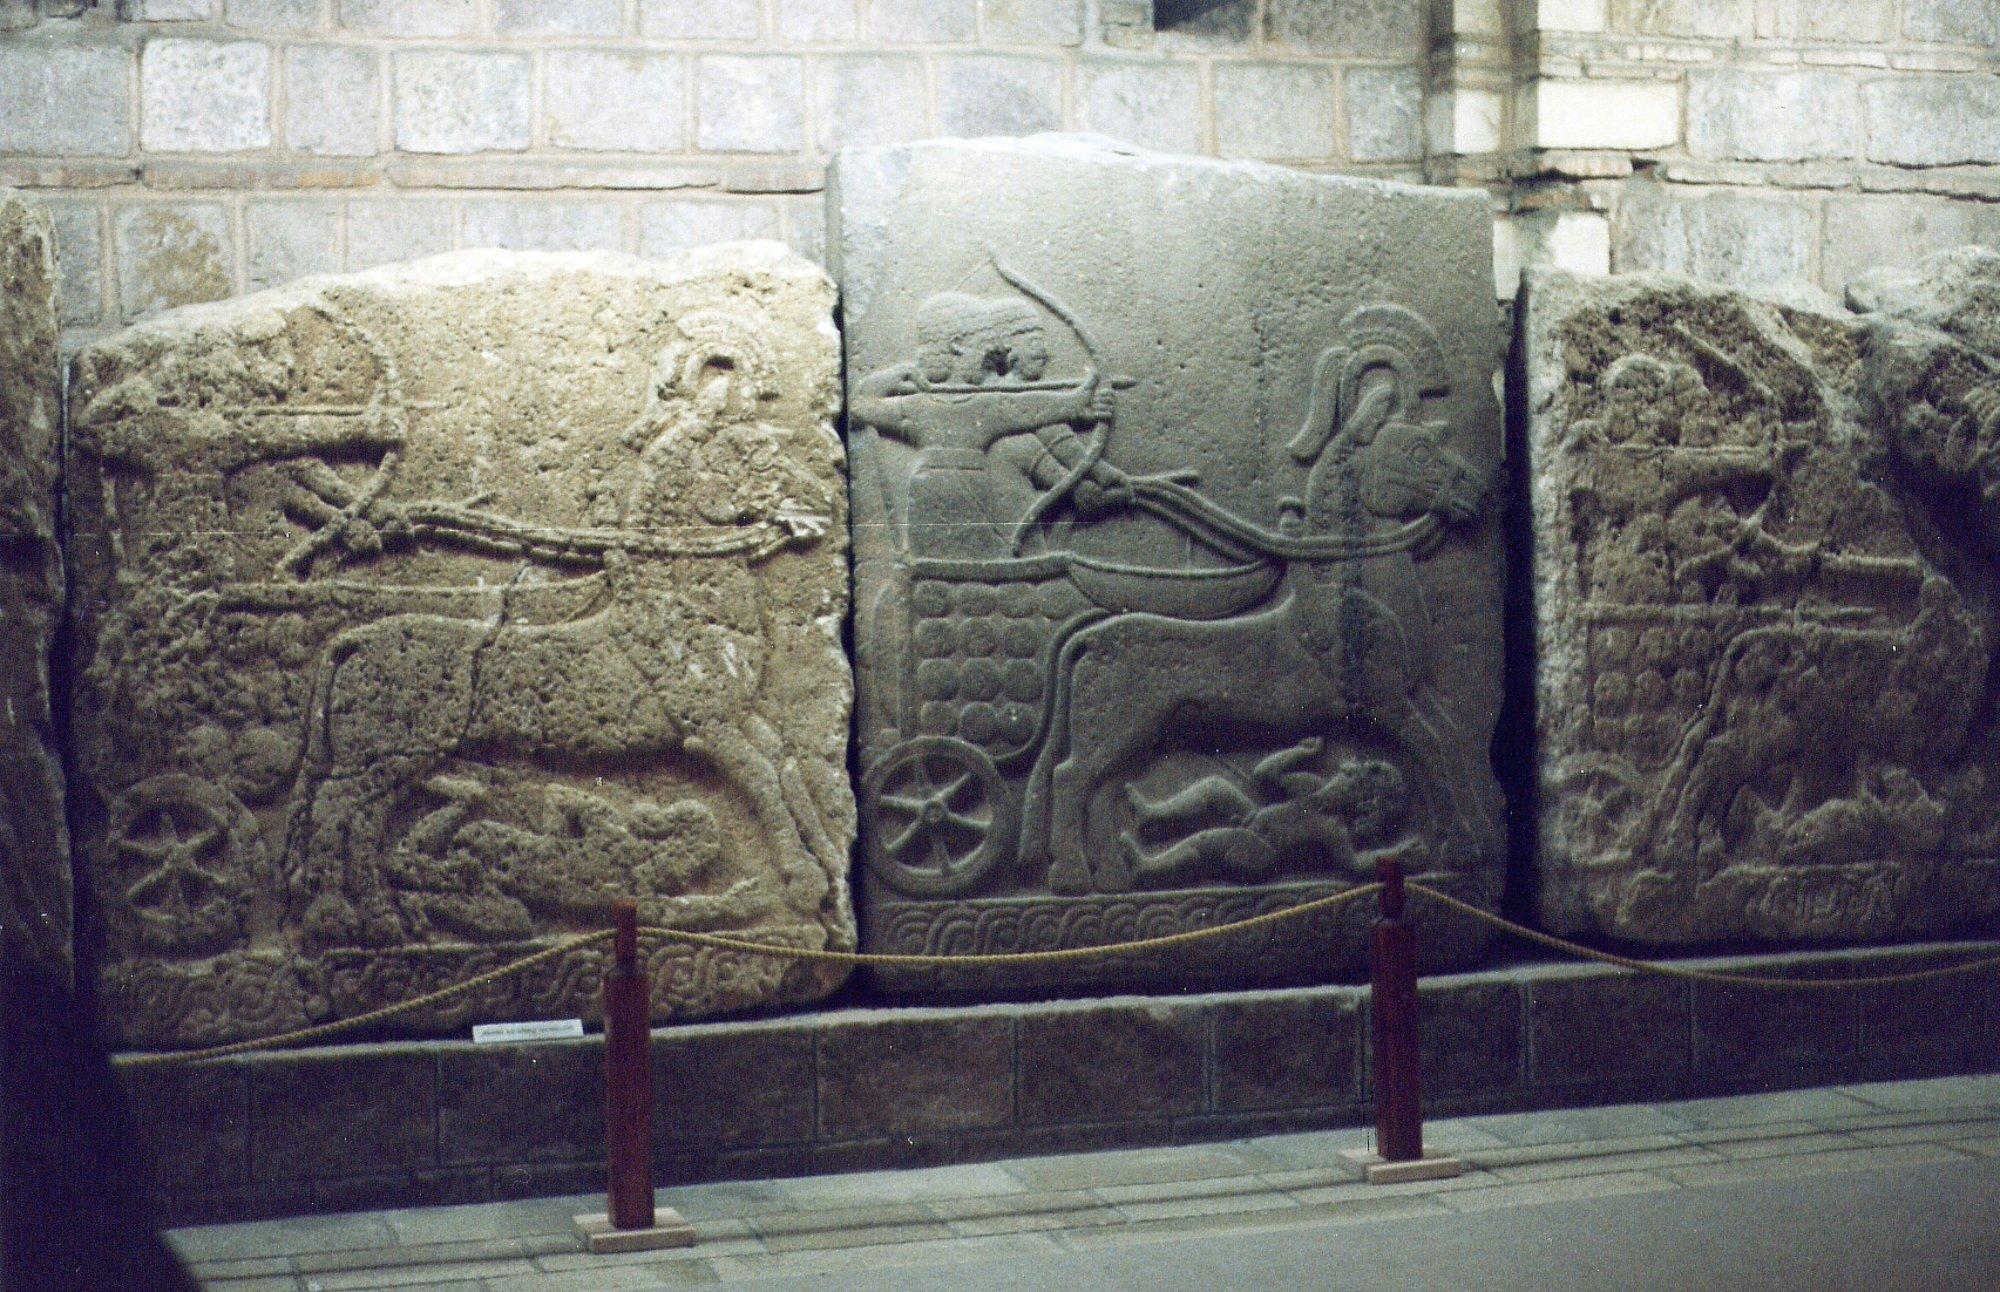 Carchemish wallpaper.jpg